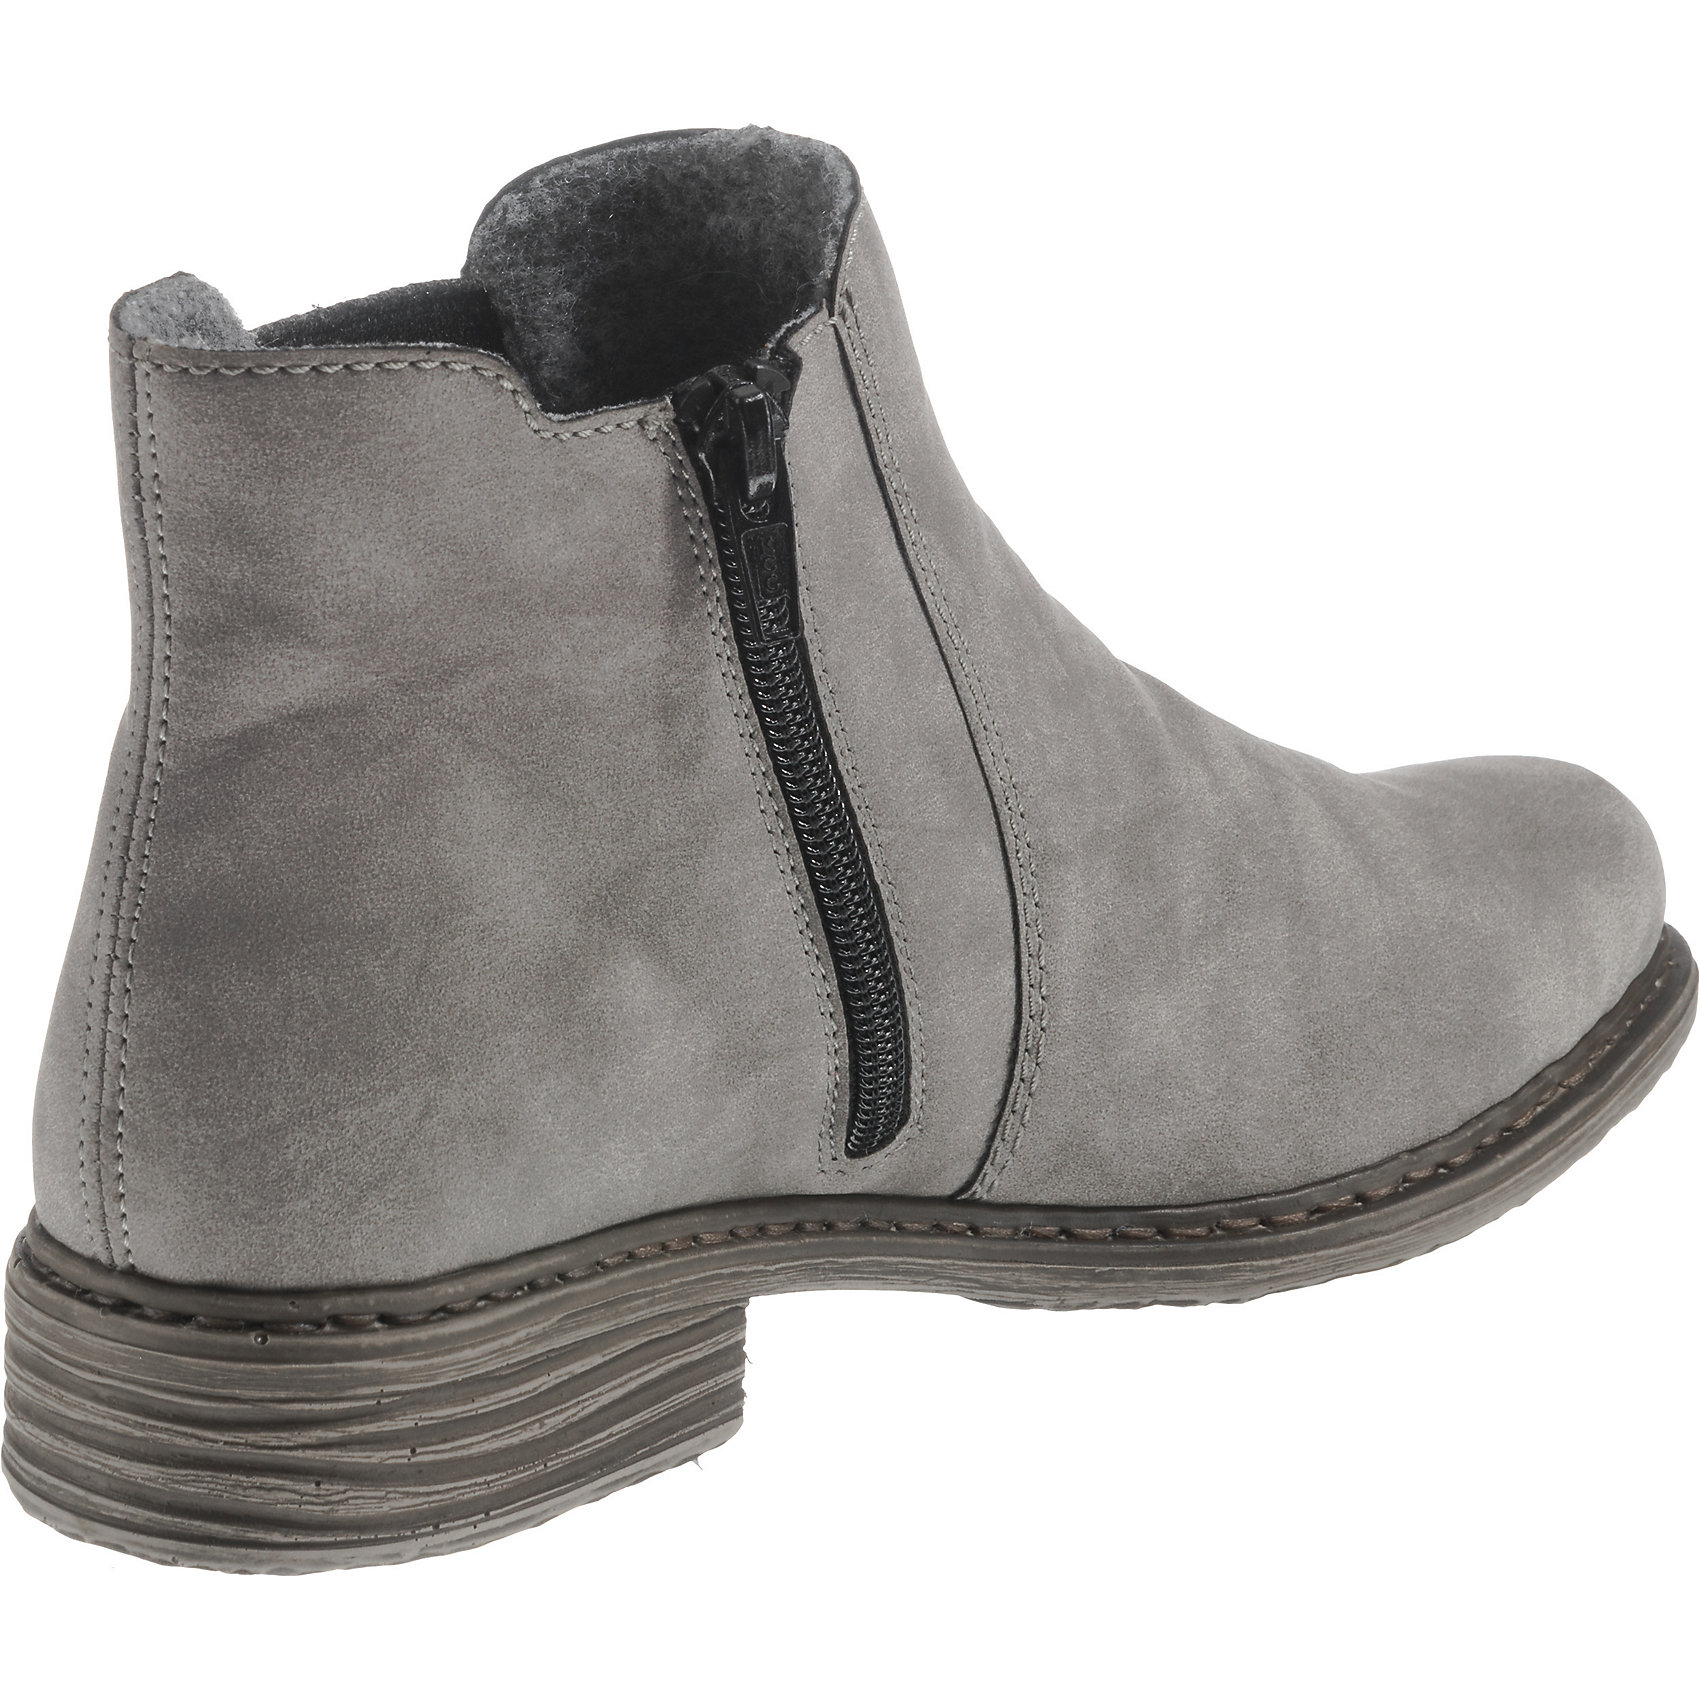 Neu rieker rieker rieker Chelsea Stiefel 8672621 für Damen grau 7caaa0